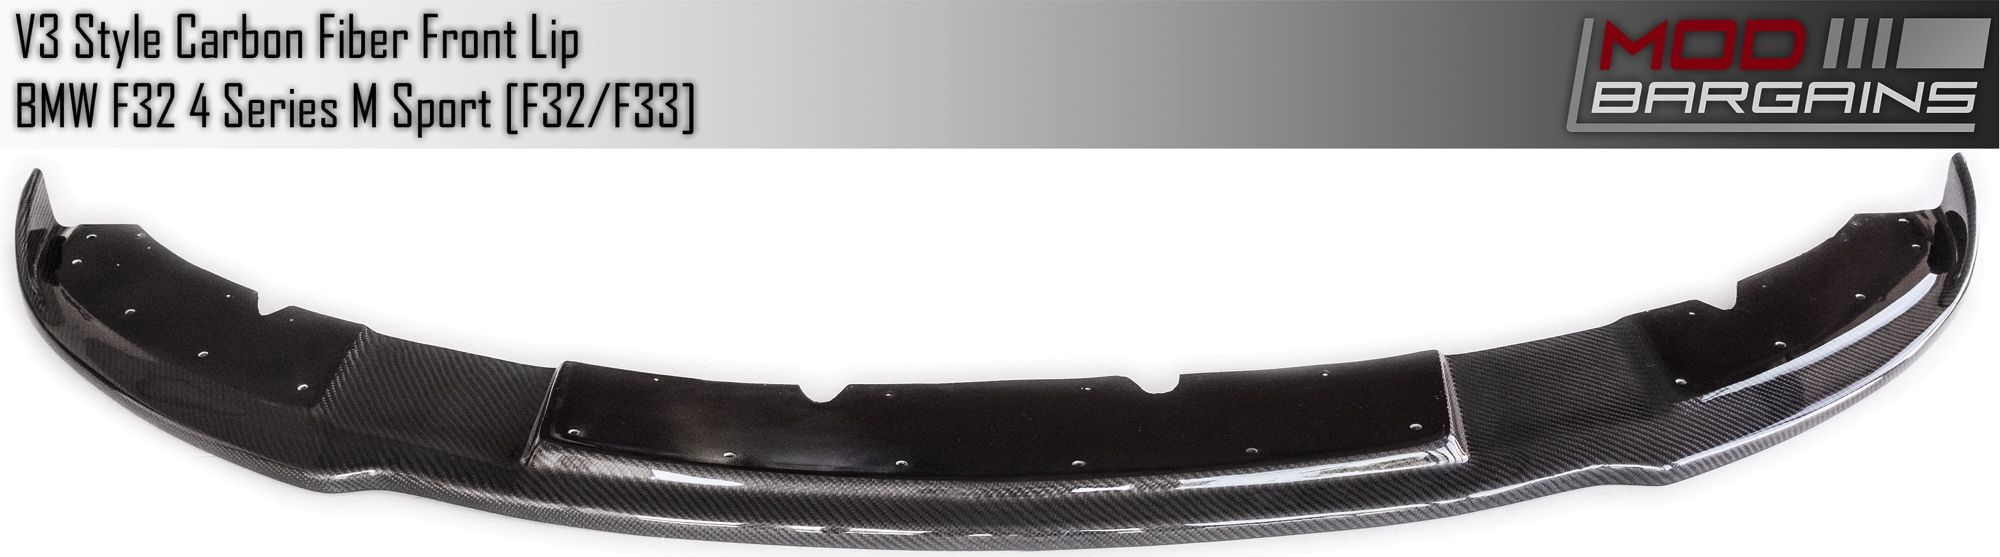 Front View V3 Carbon Fiber Front Lip BMFS3225